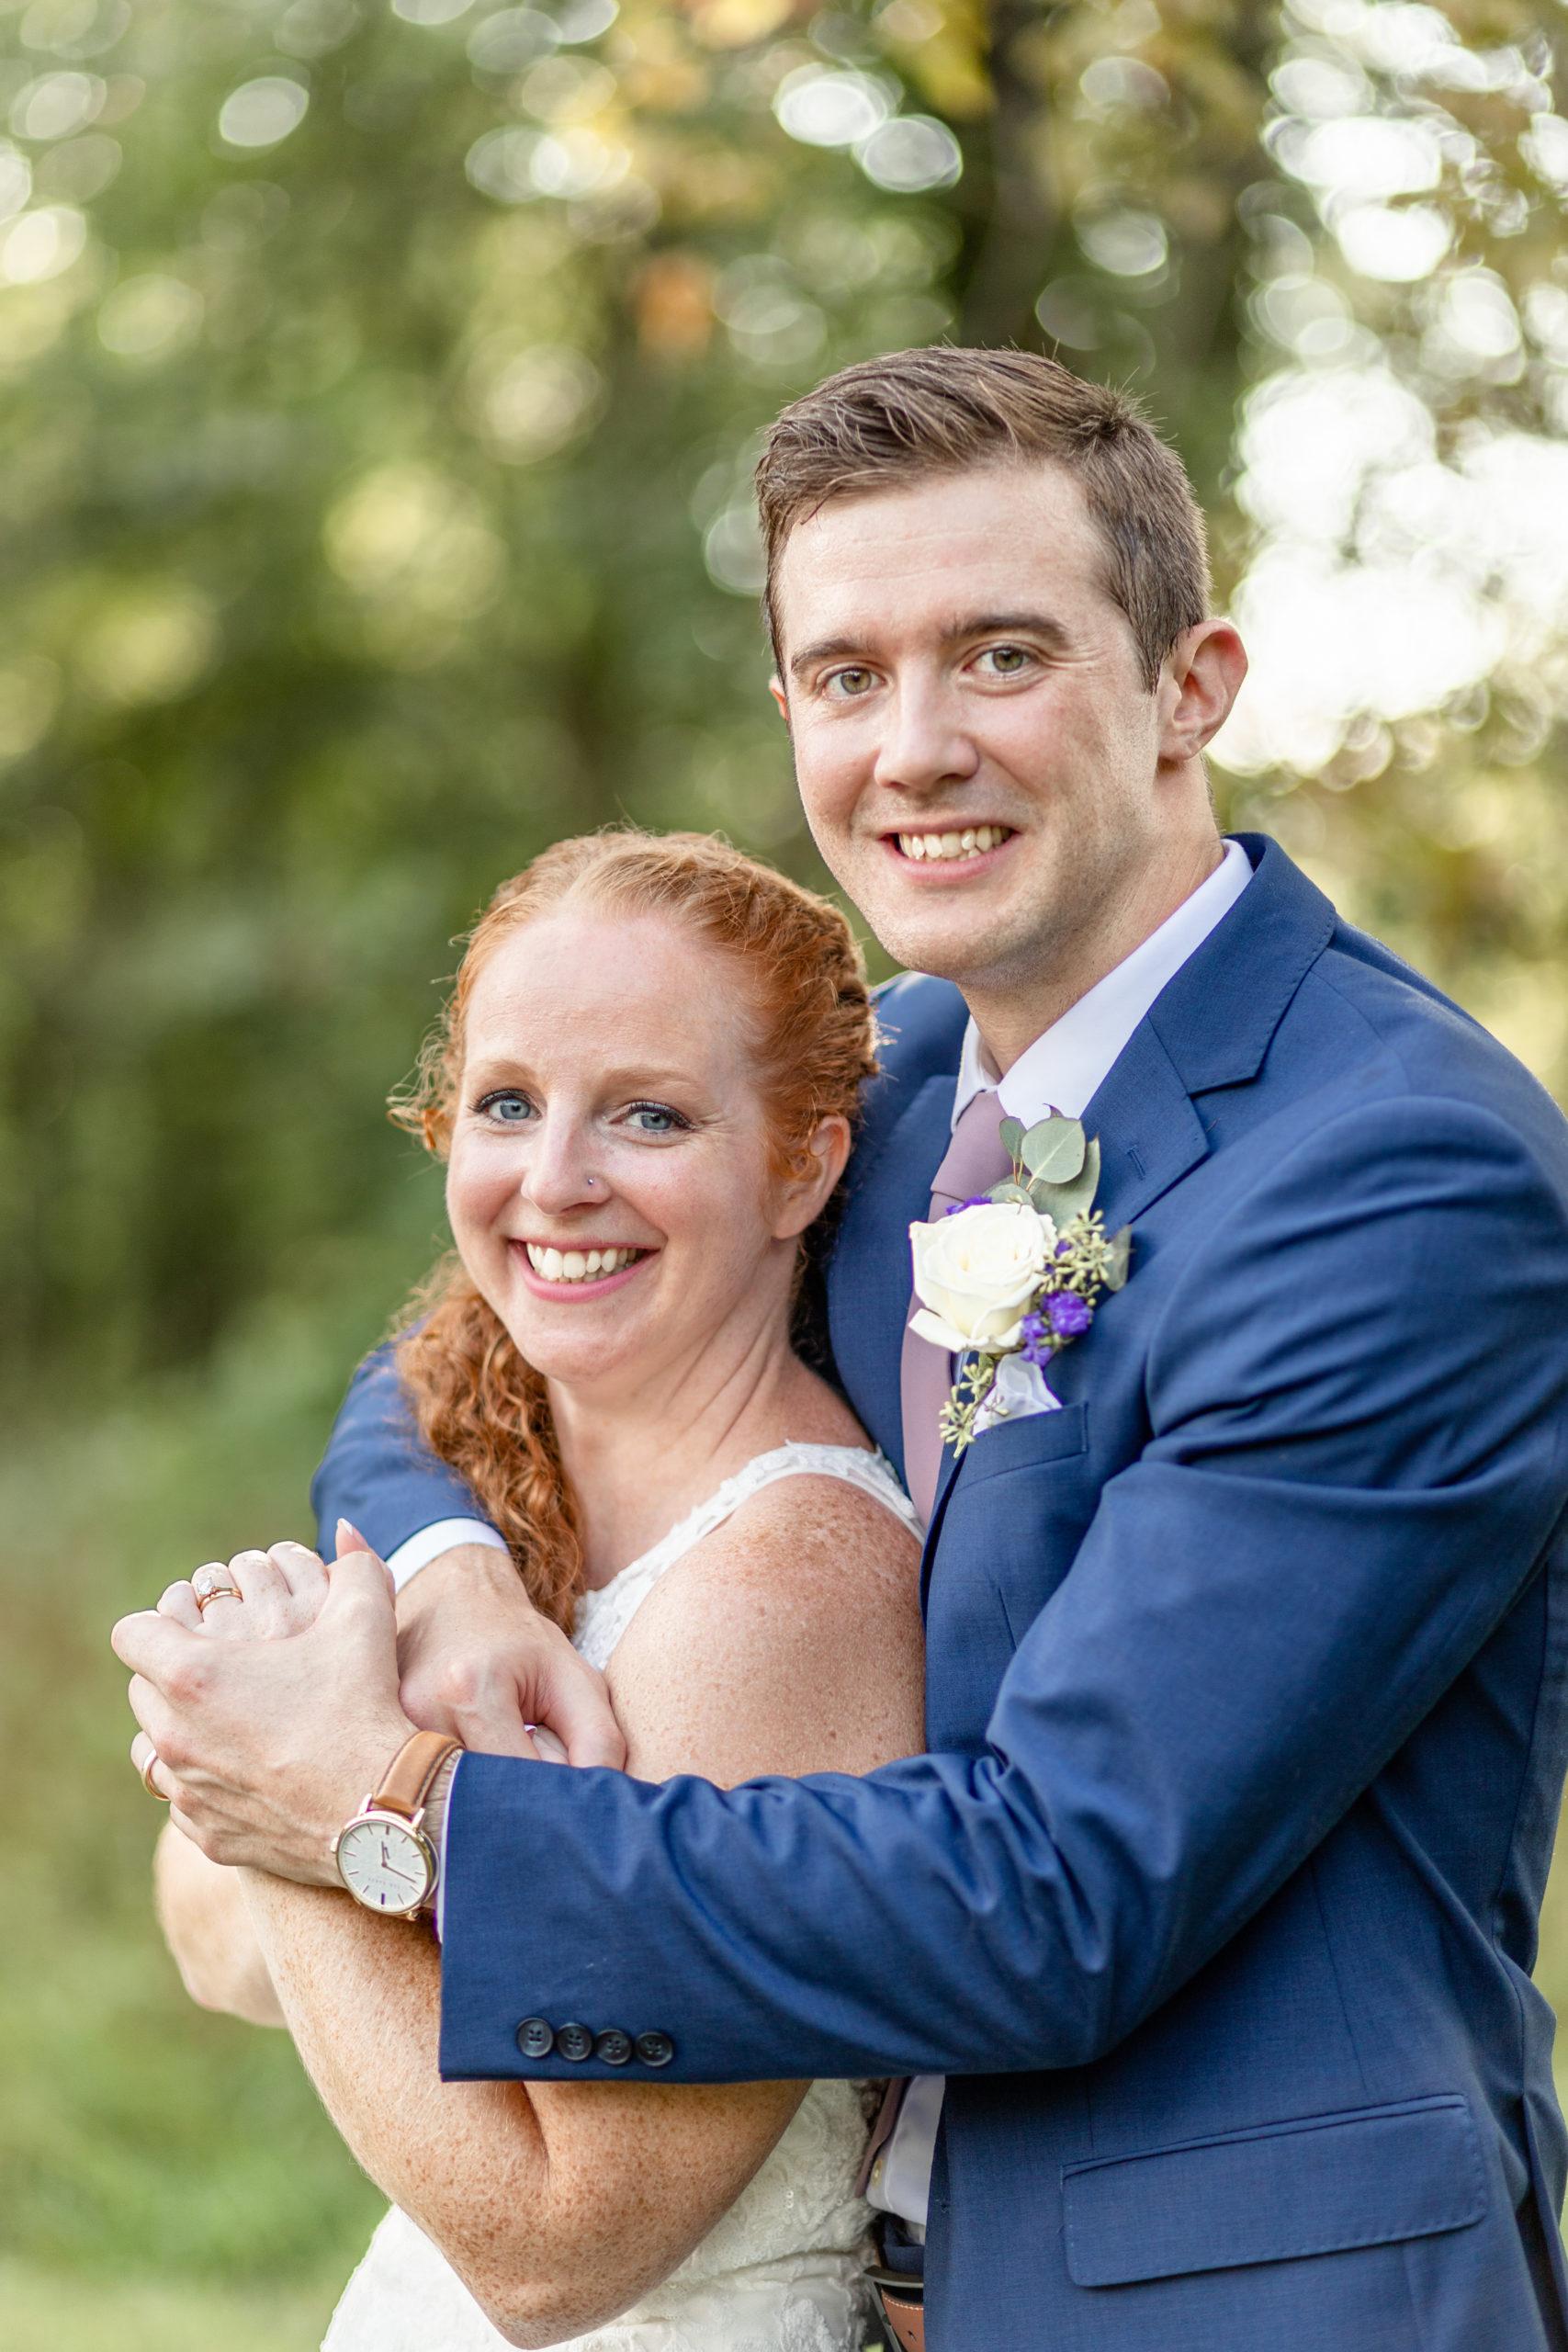 wedding photography, summer romance wedding, purple wedding accents, southern illinois wedding photography, woodland romance, lakeside wedding, purple and blue wedding